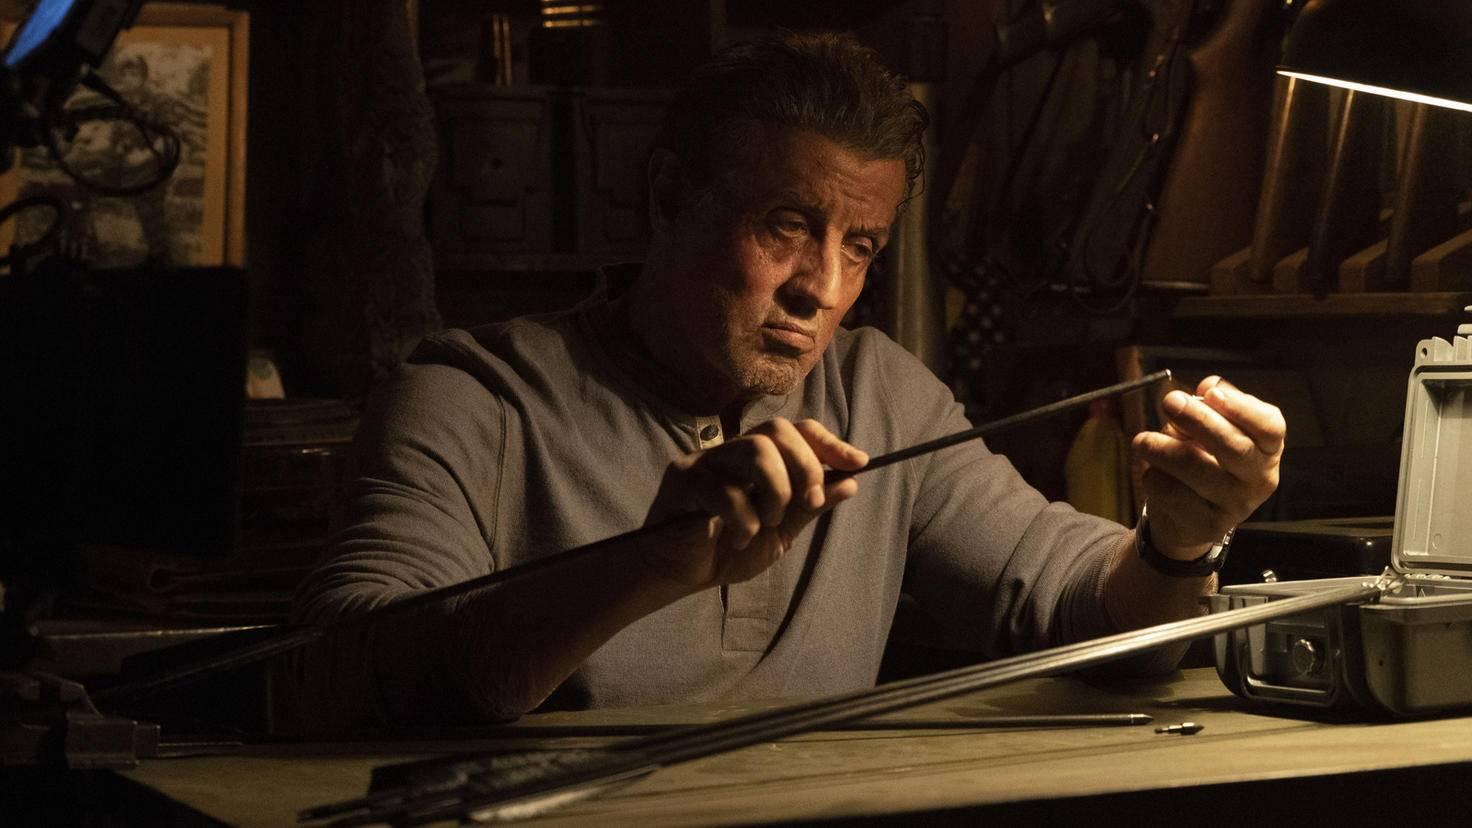 Rambo 5 Last Blood-Sylvester Stallone as John Rambo Universe movie